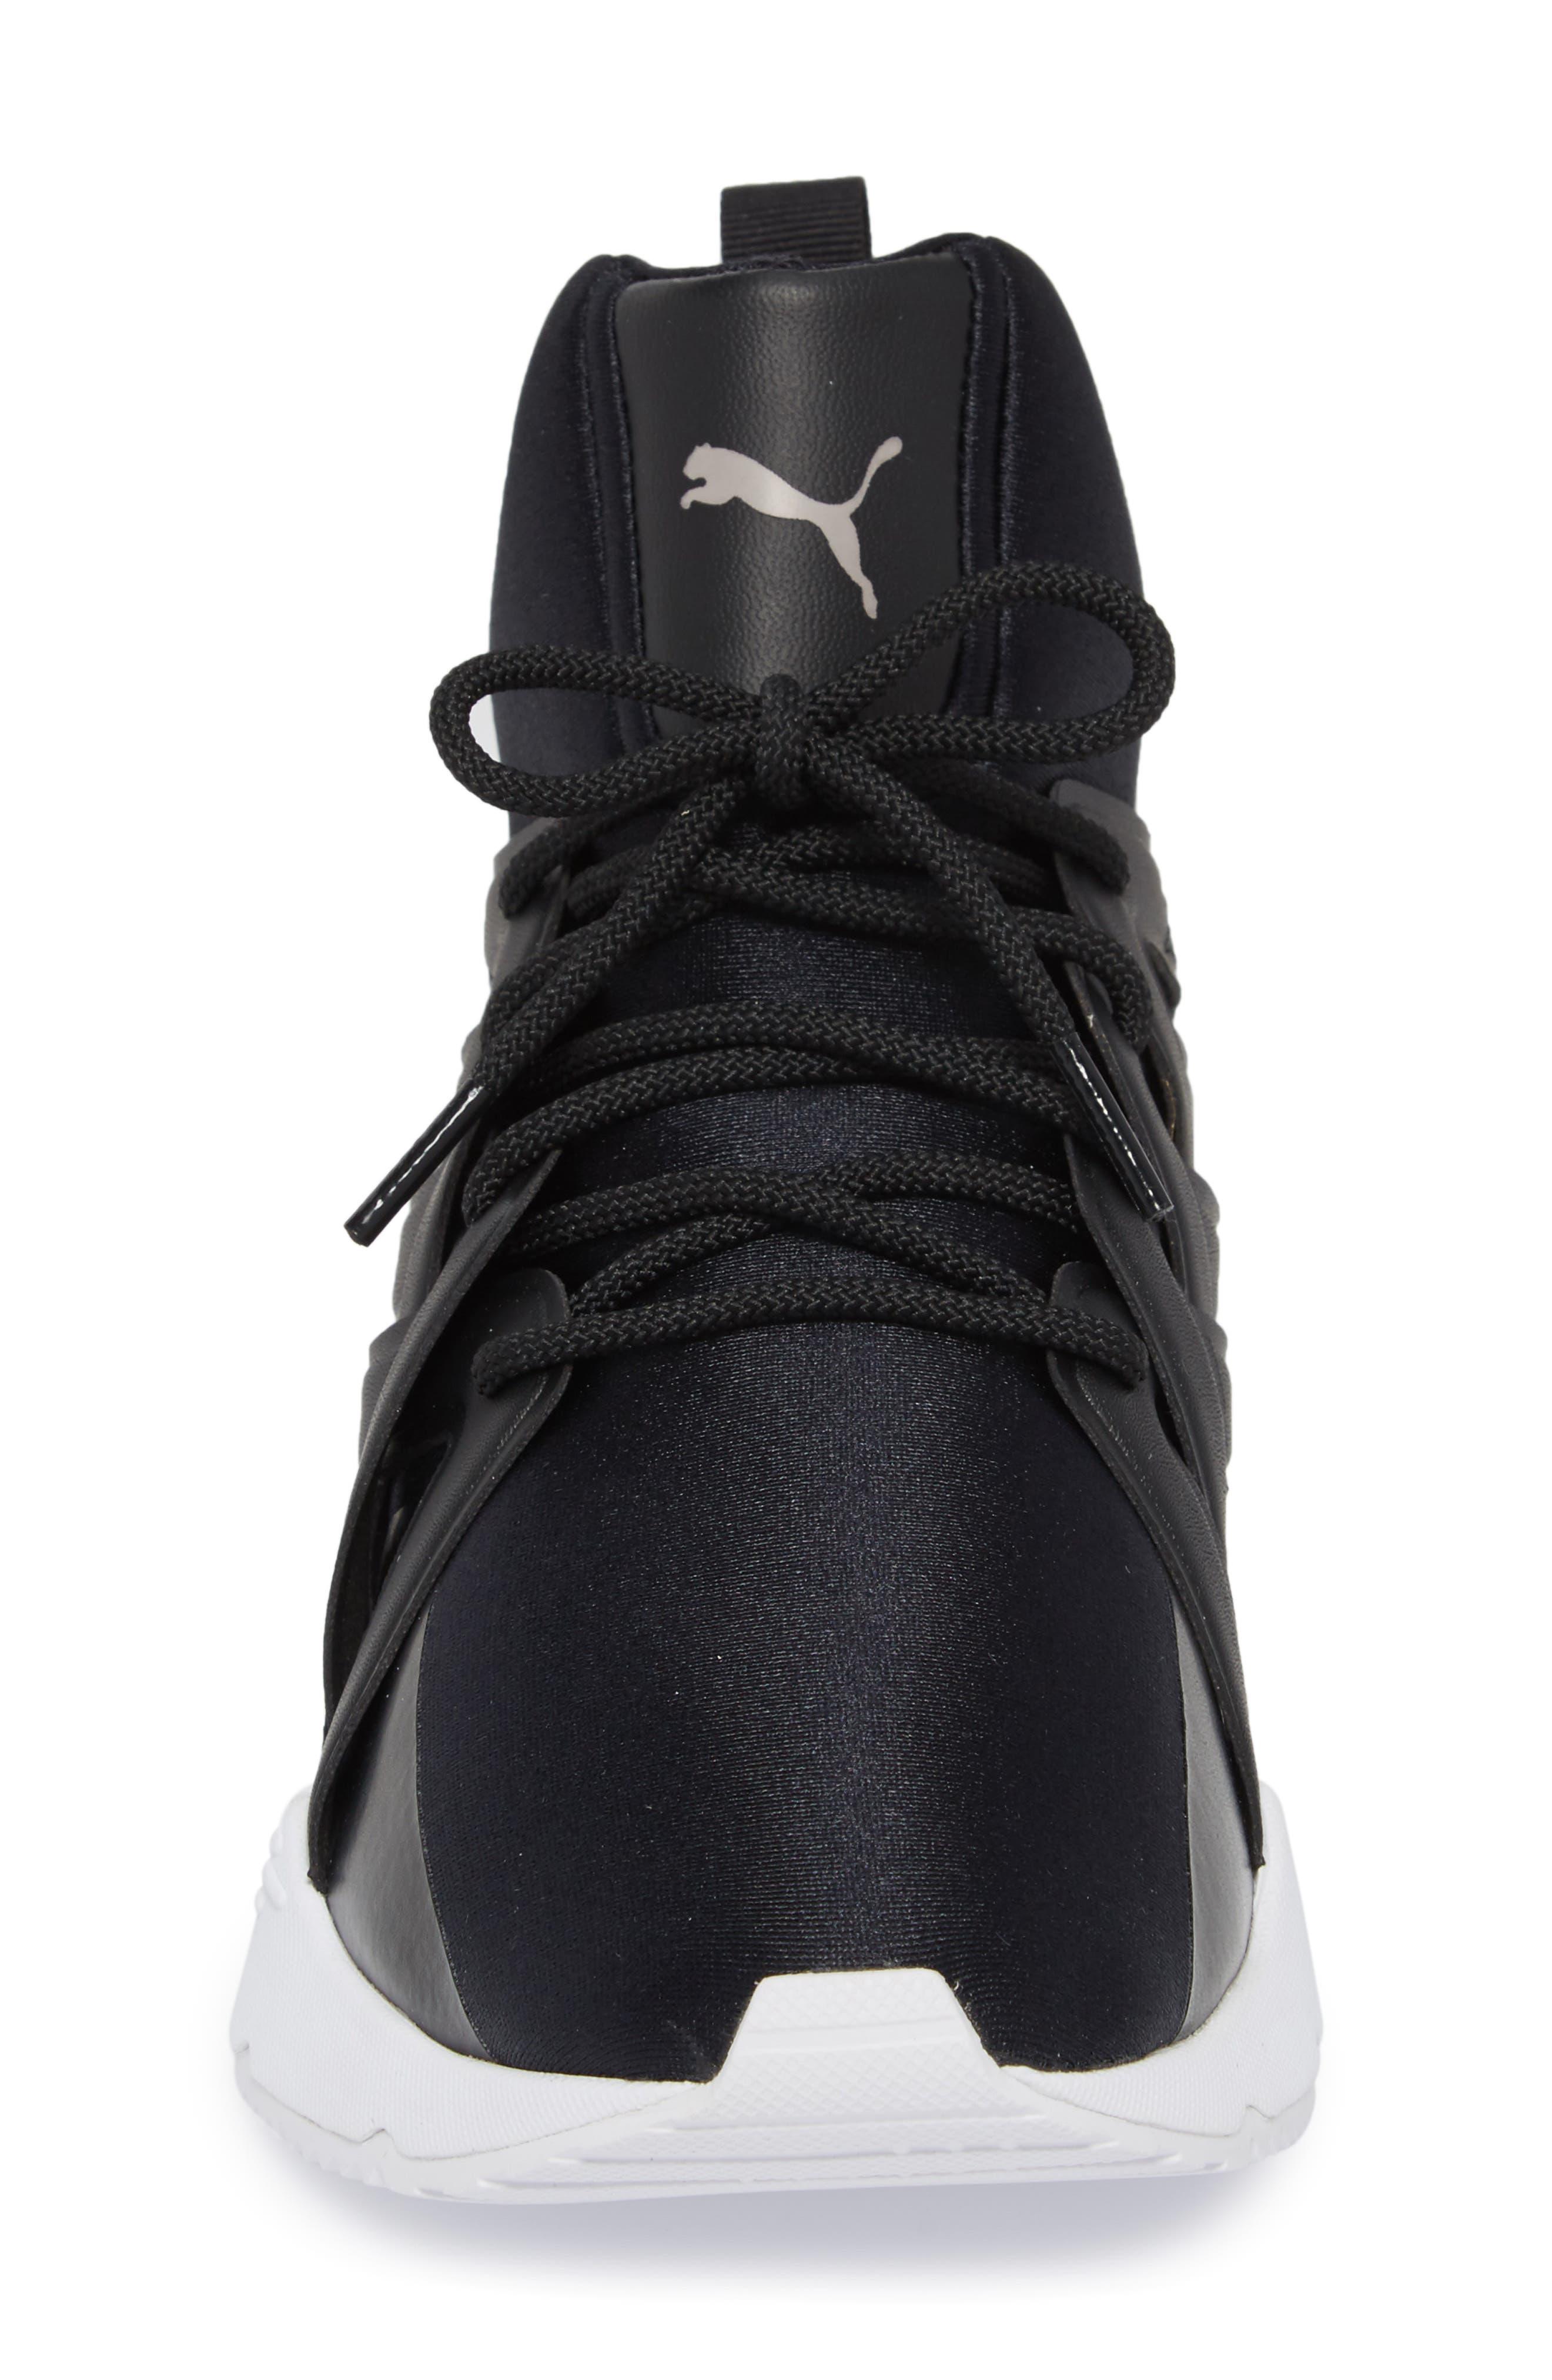 Muse Echo Satin En Pointe High Top Sneaker,                             Alternate thumbnail 4, color,                             Puma Black/ Puma White